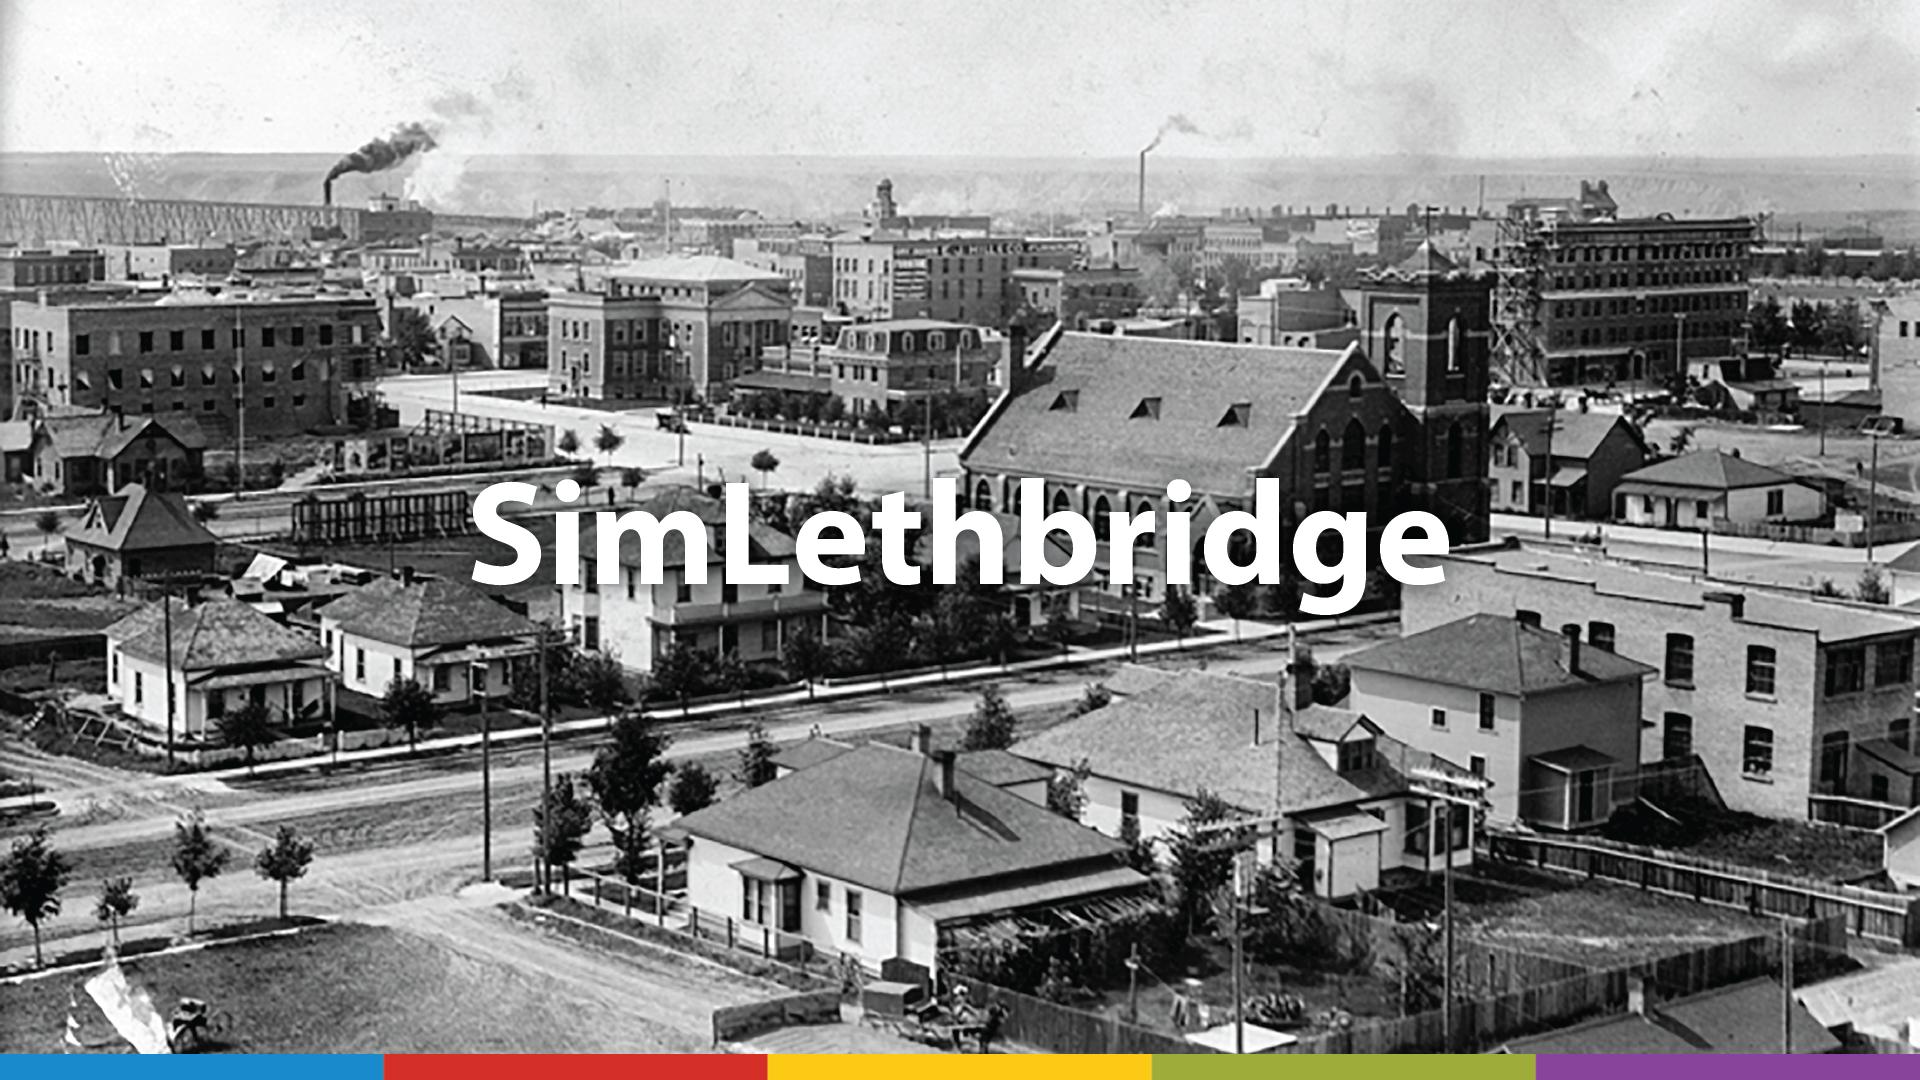 SimLethbridgeEventBanner-01.png